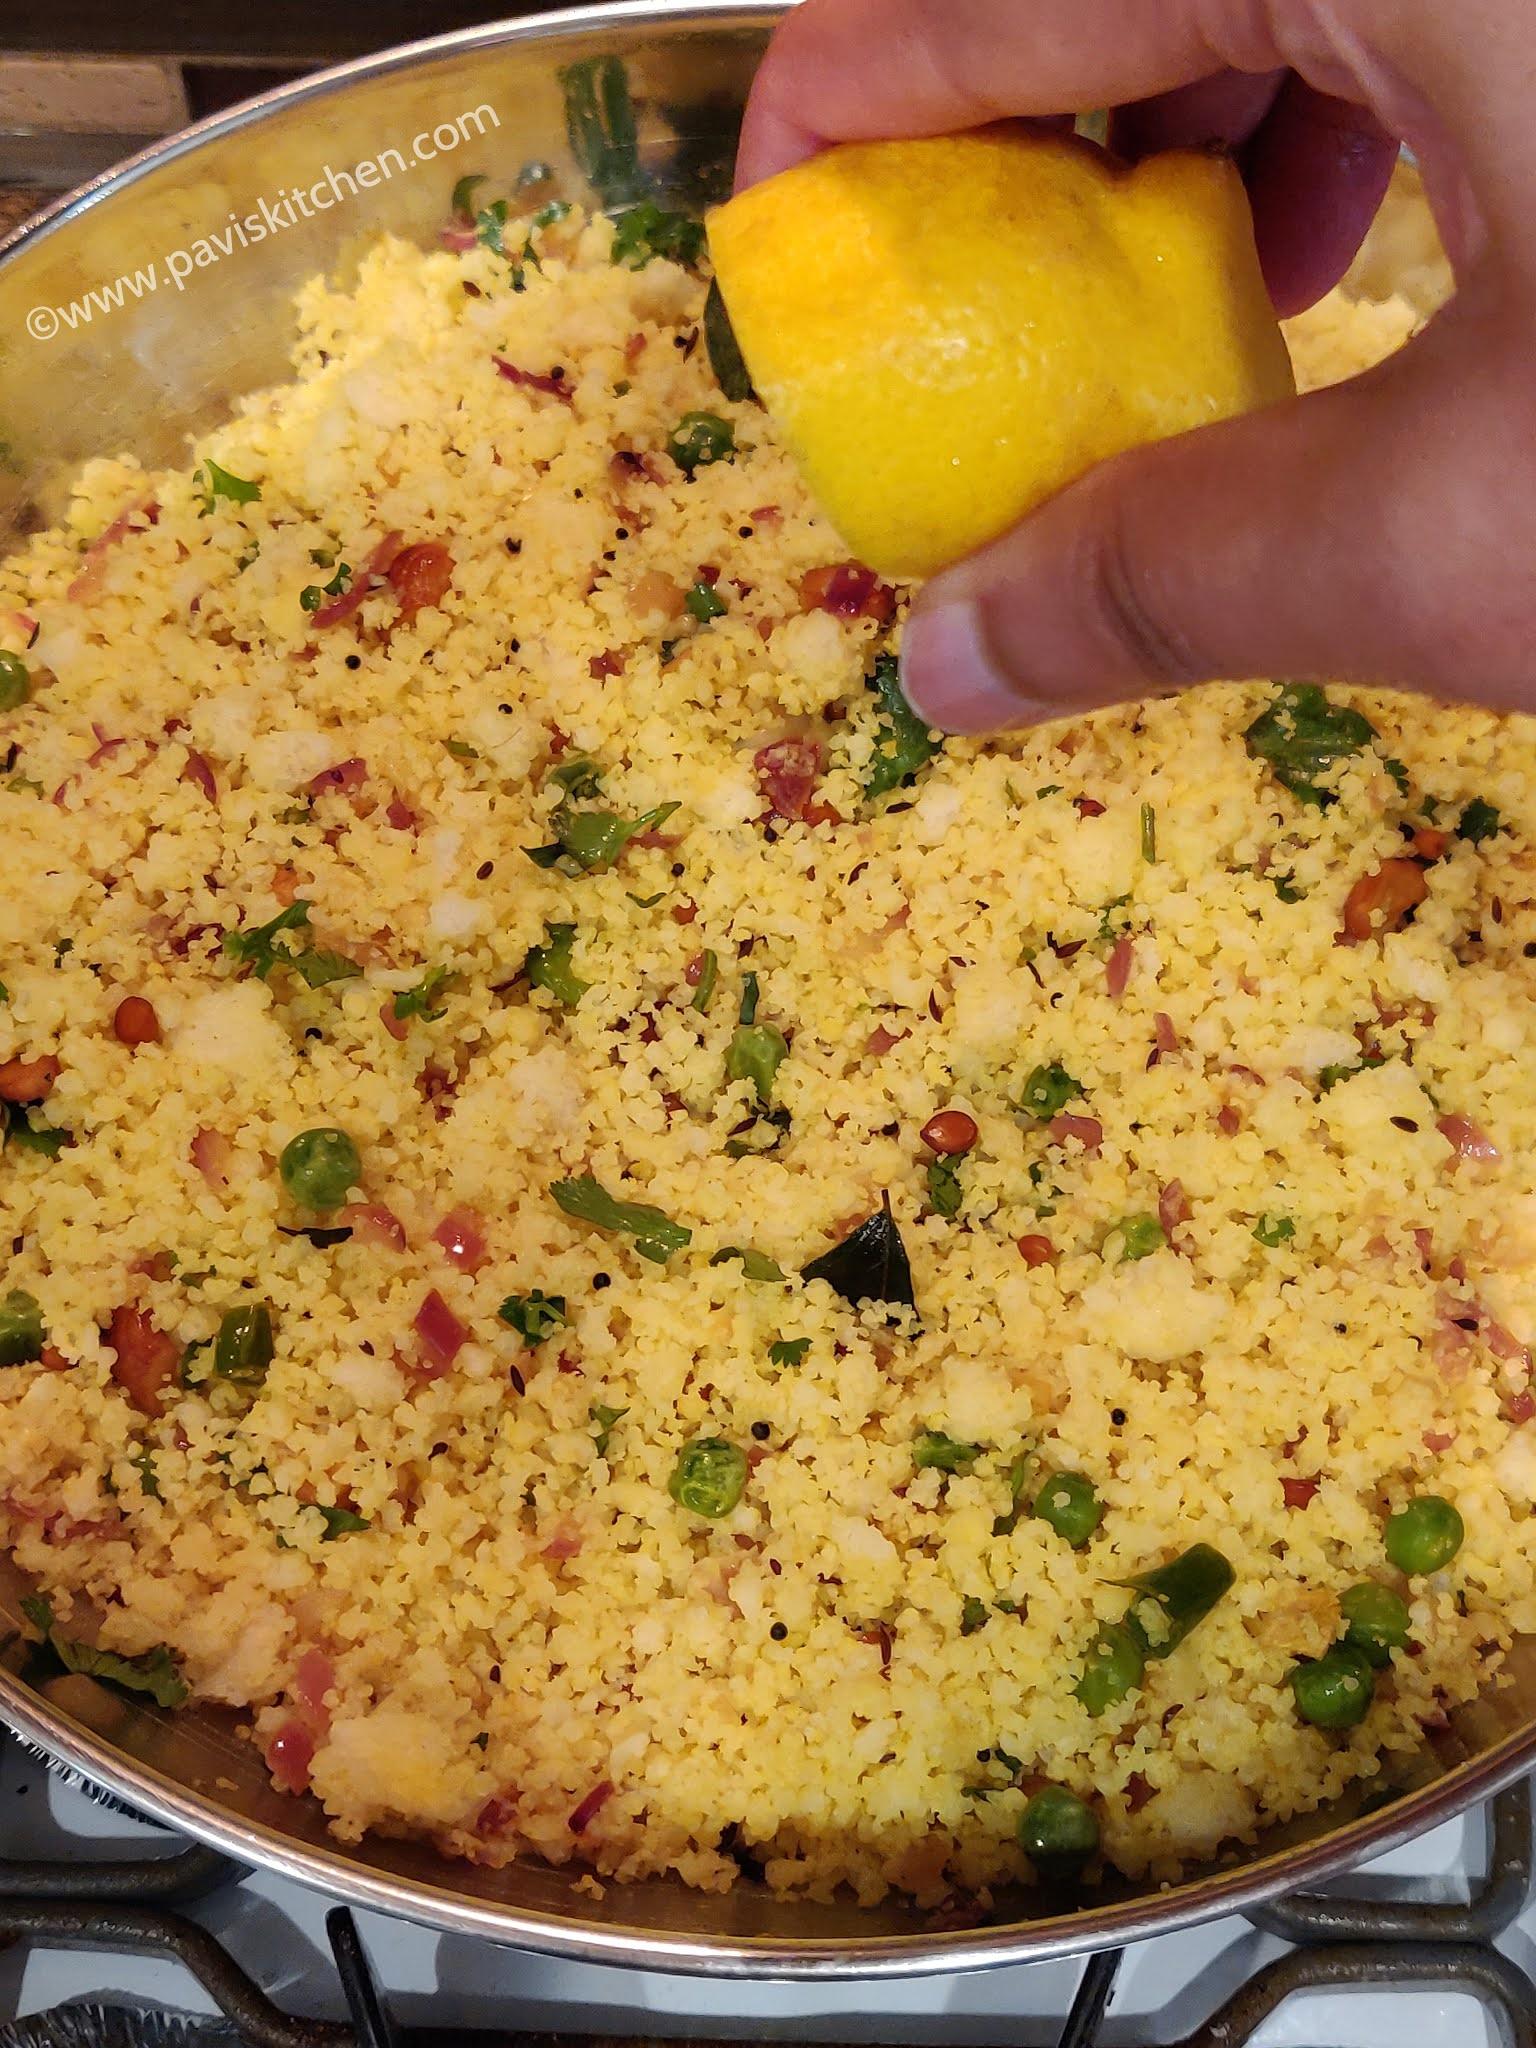 Idli upma recipe | How to make idli upma | Idly upma with leftover idli recipes